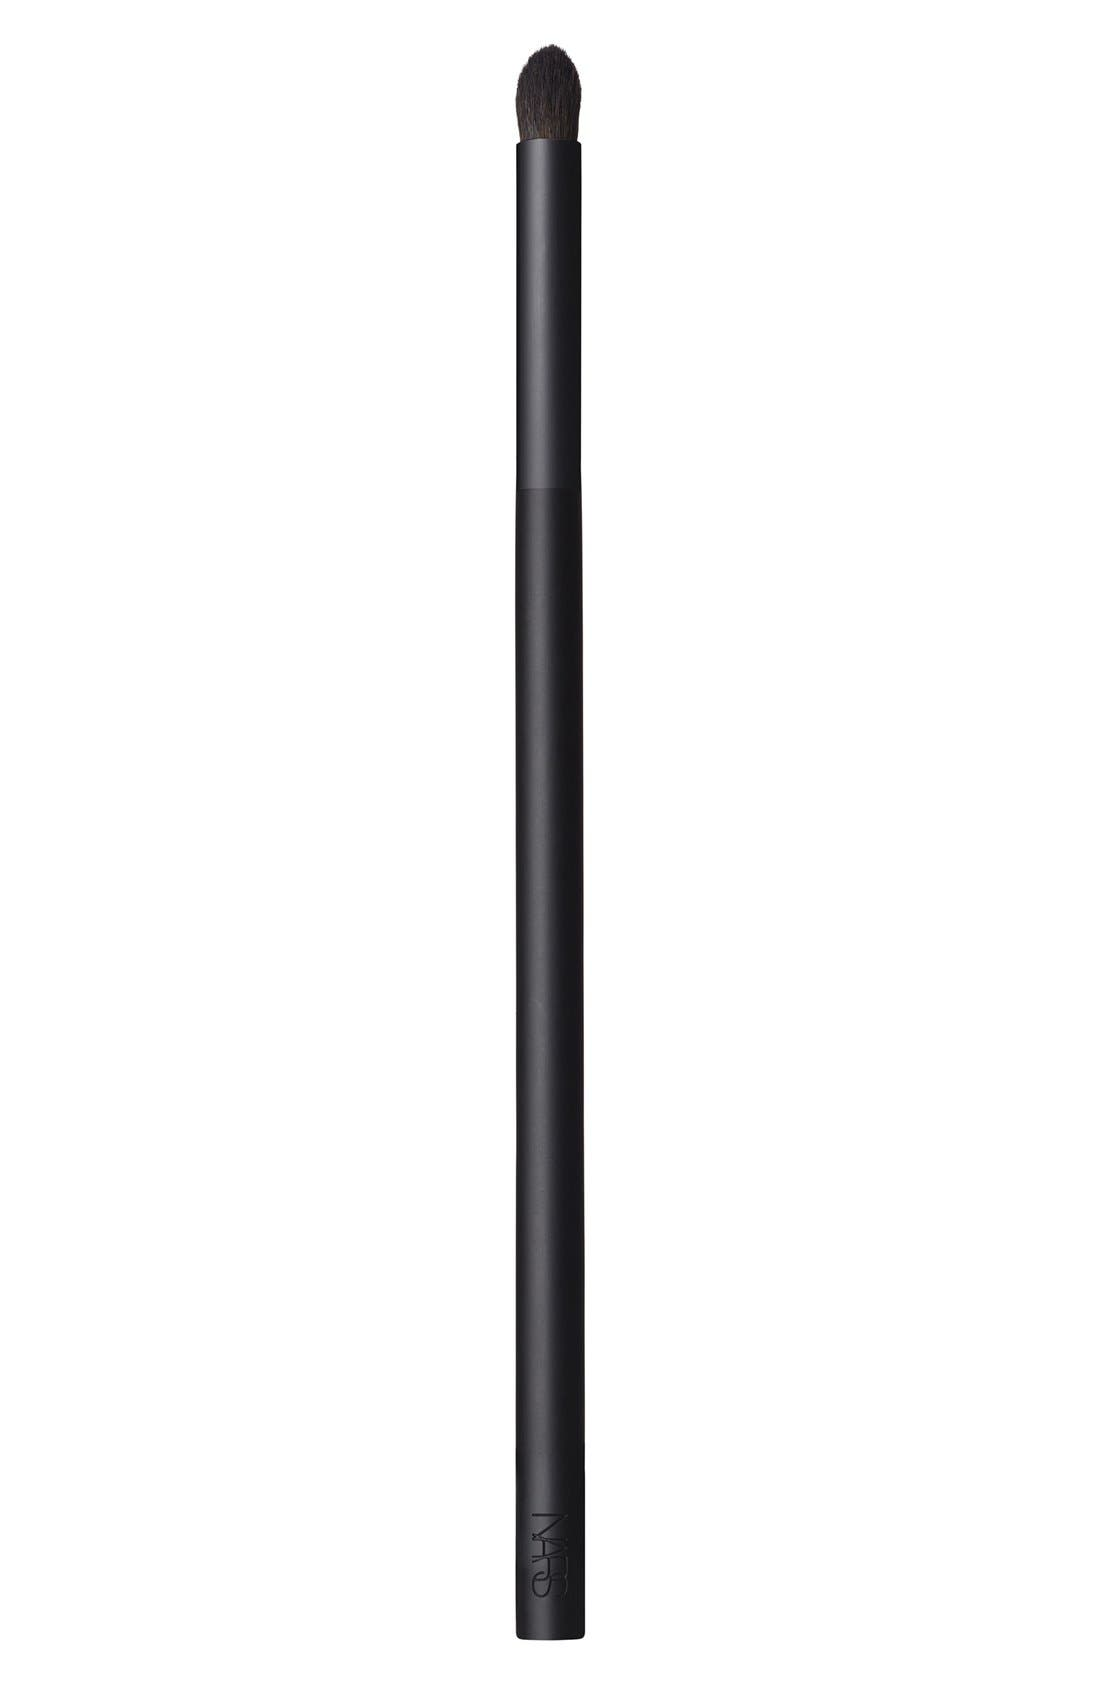 NARS #44 Precision Contour Brush